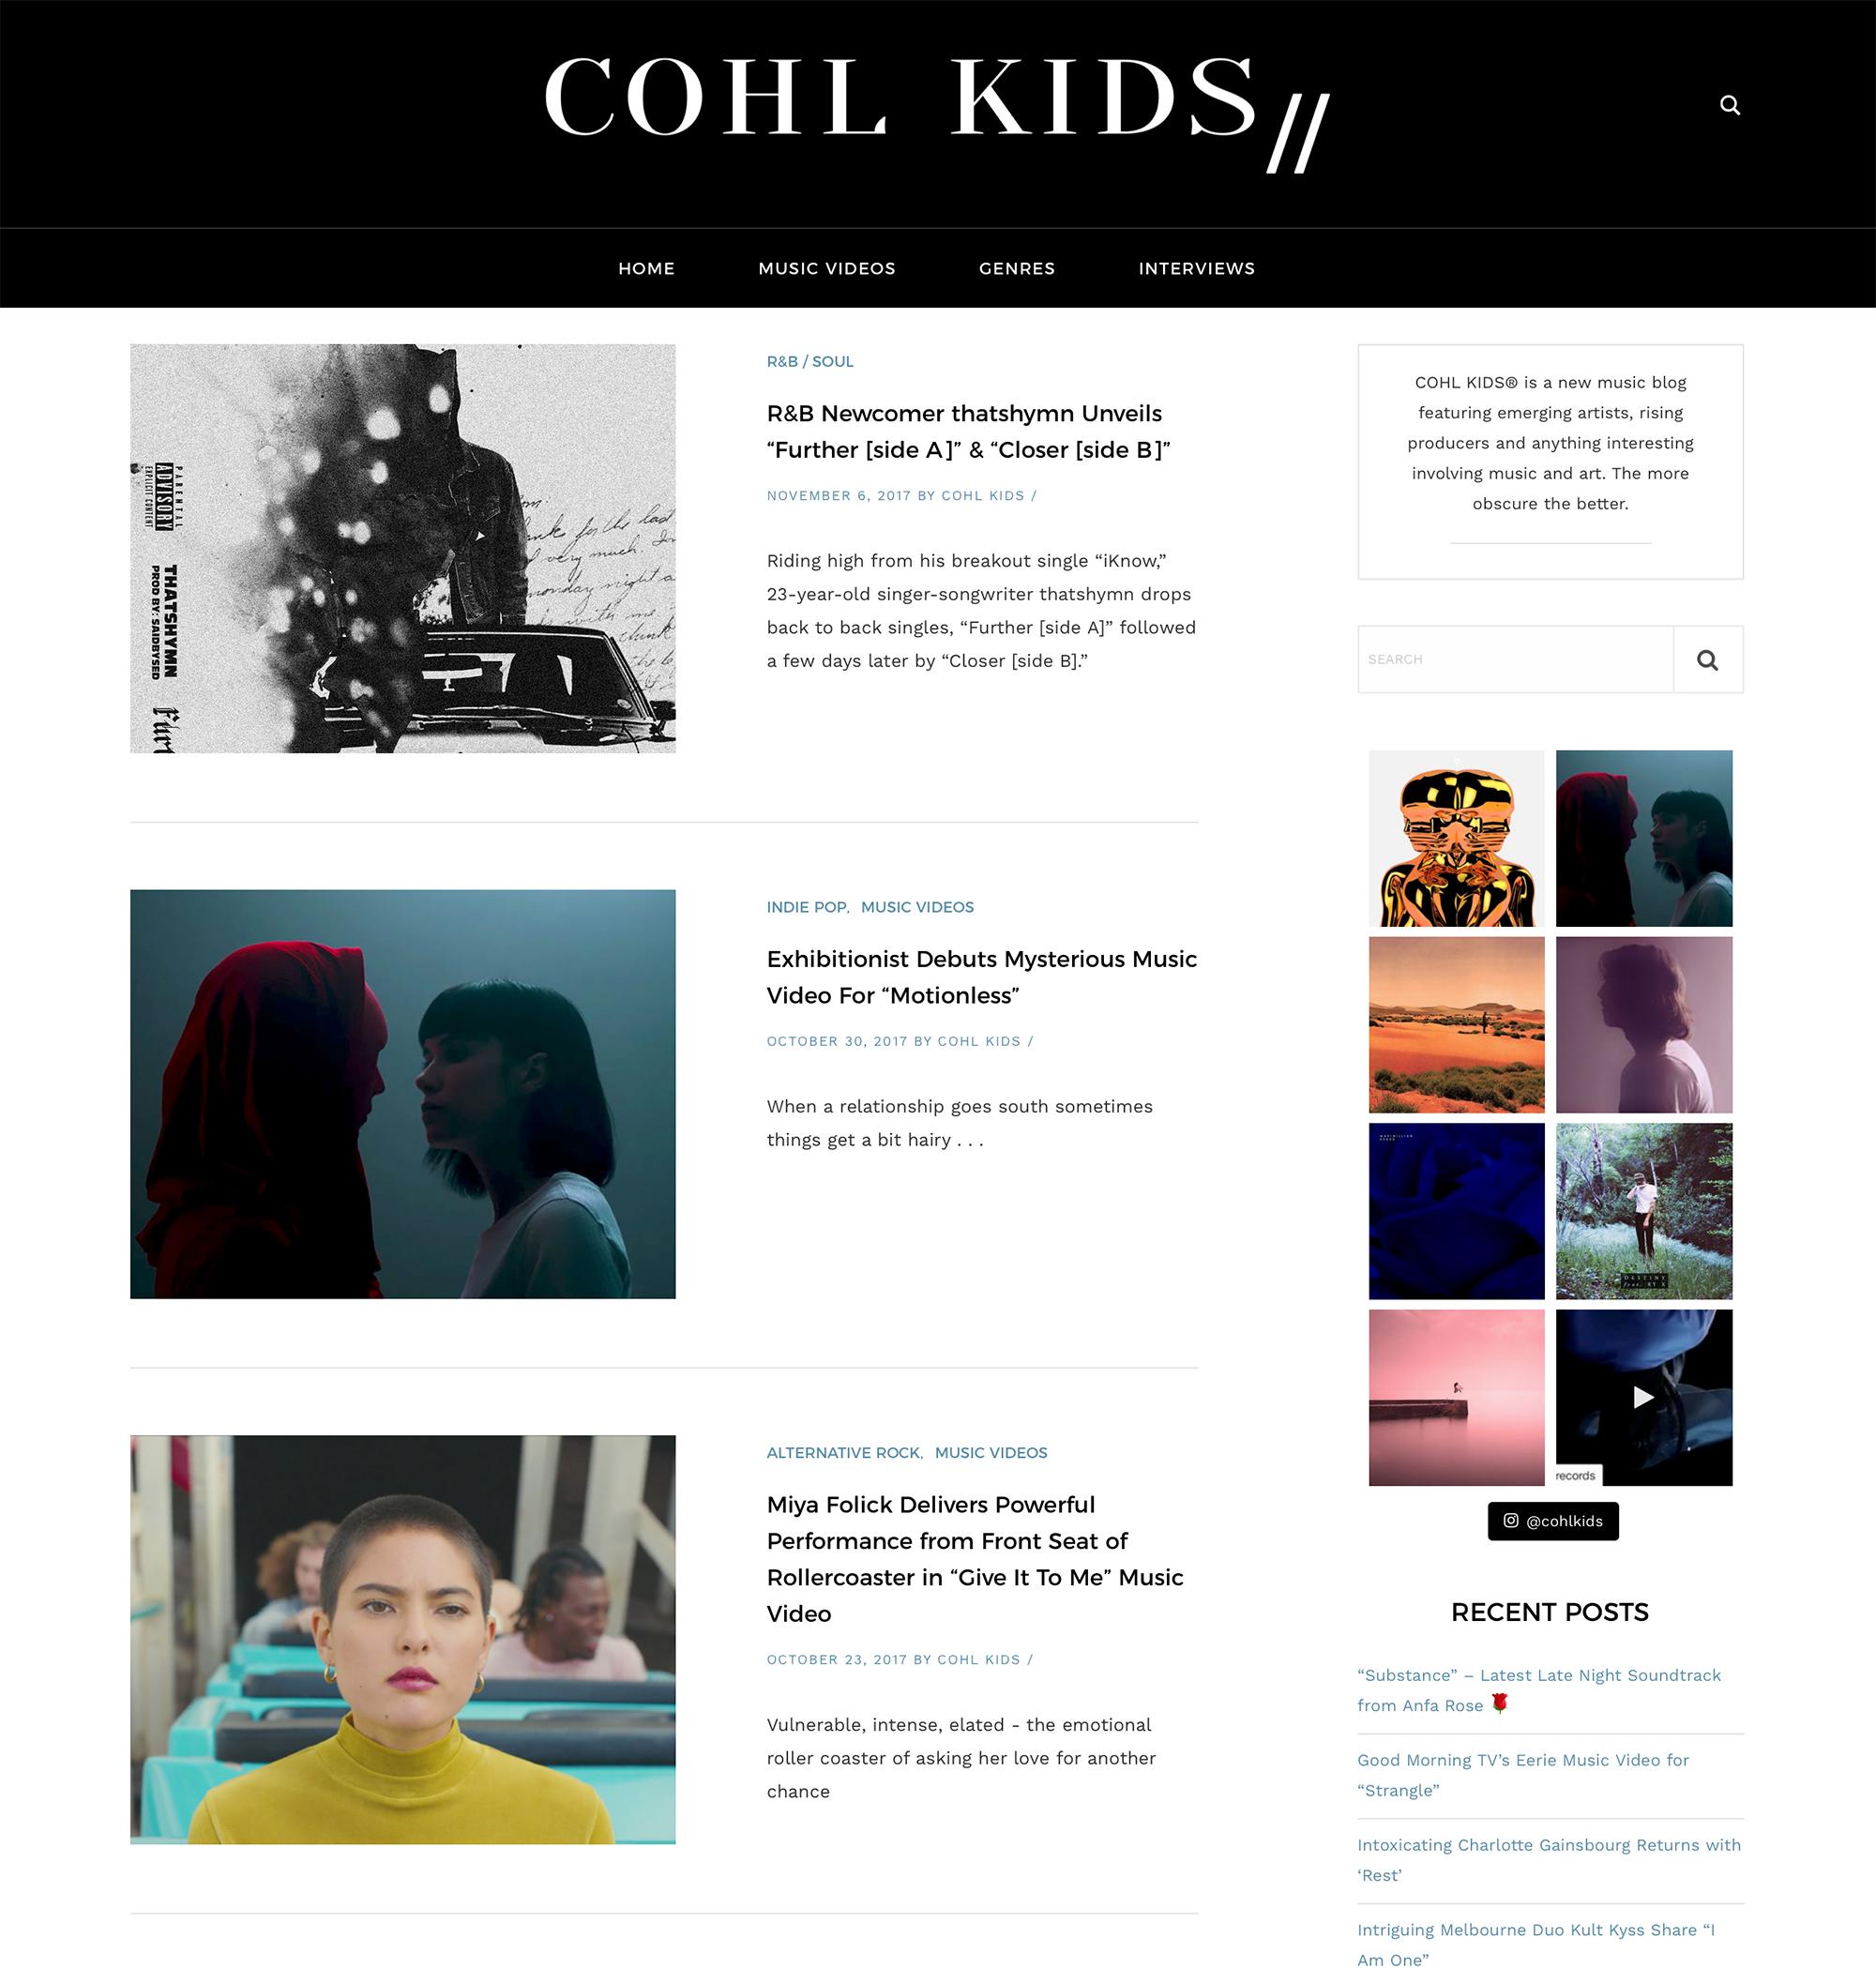 COHL KIDS Website Home.jpg